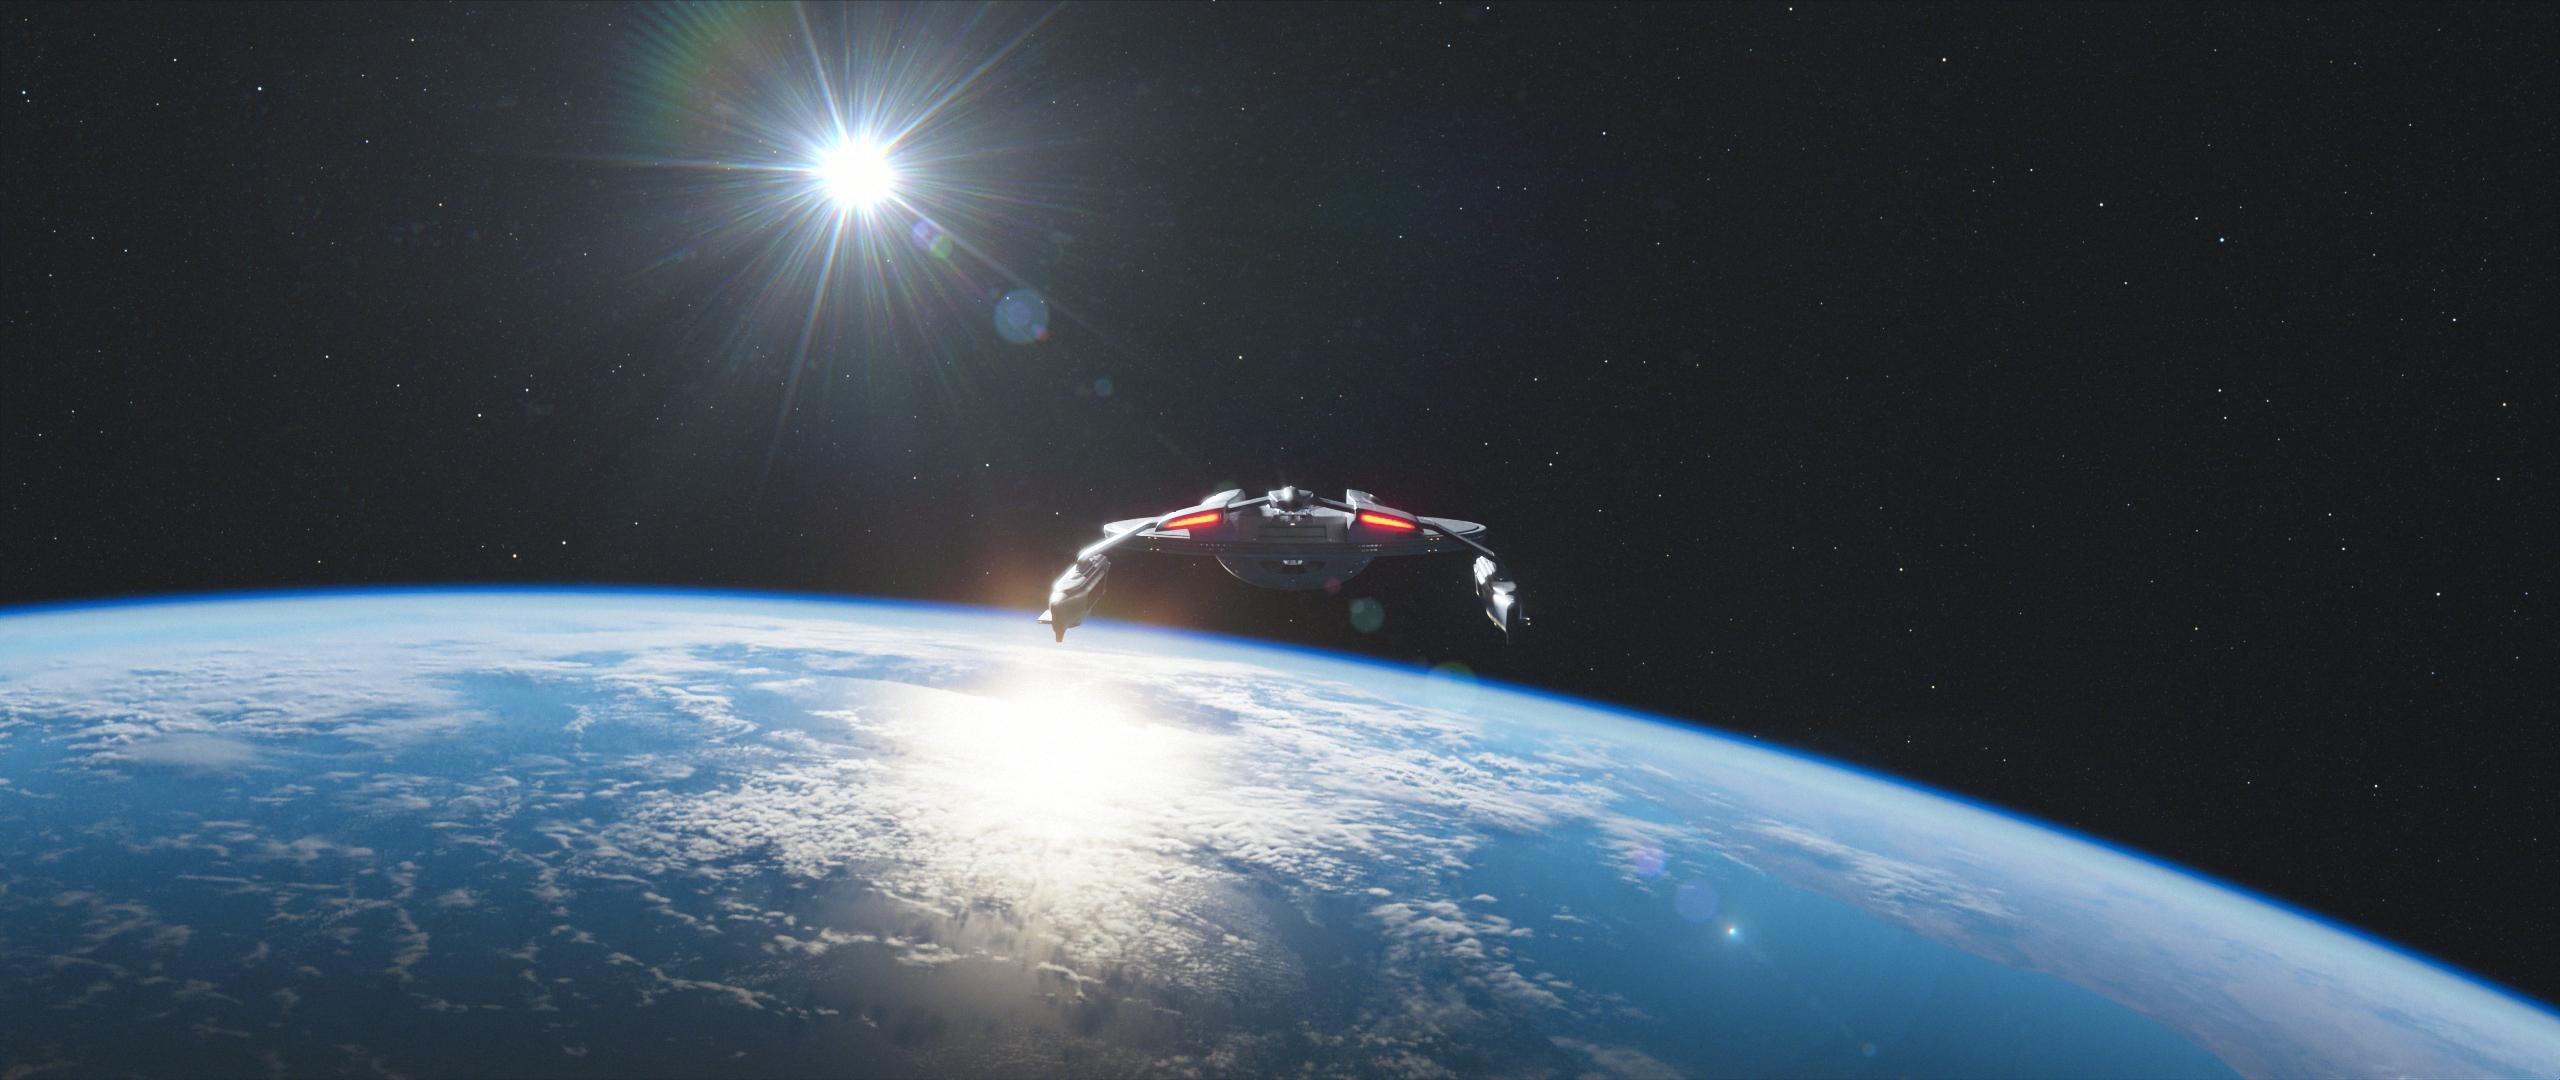 earthrise8.jpg